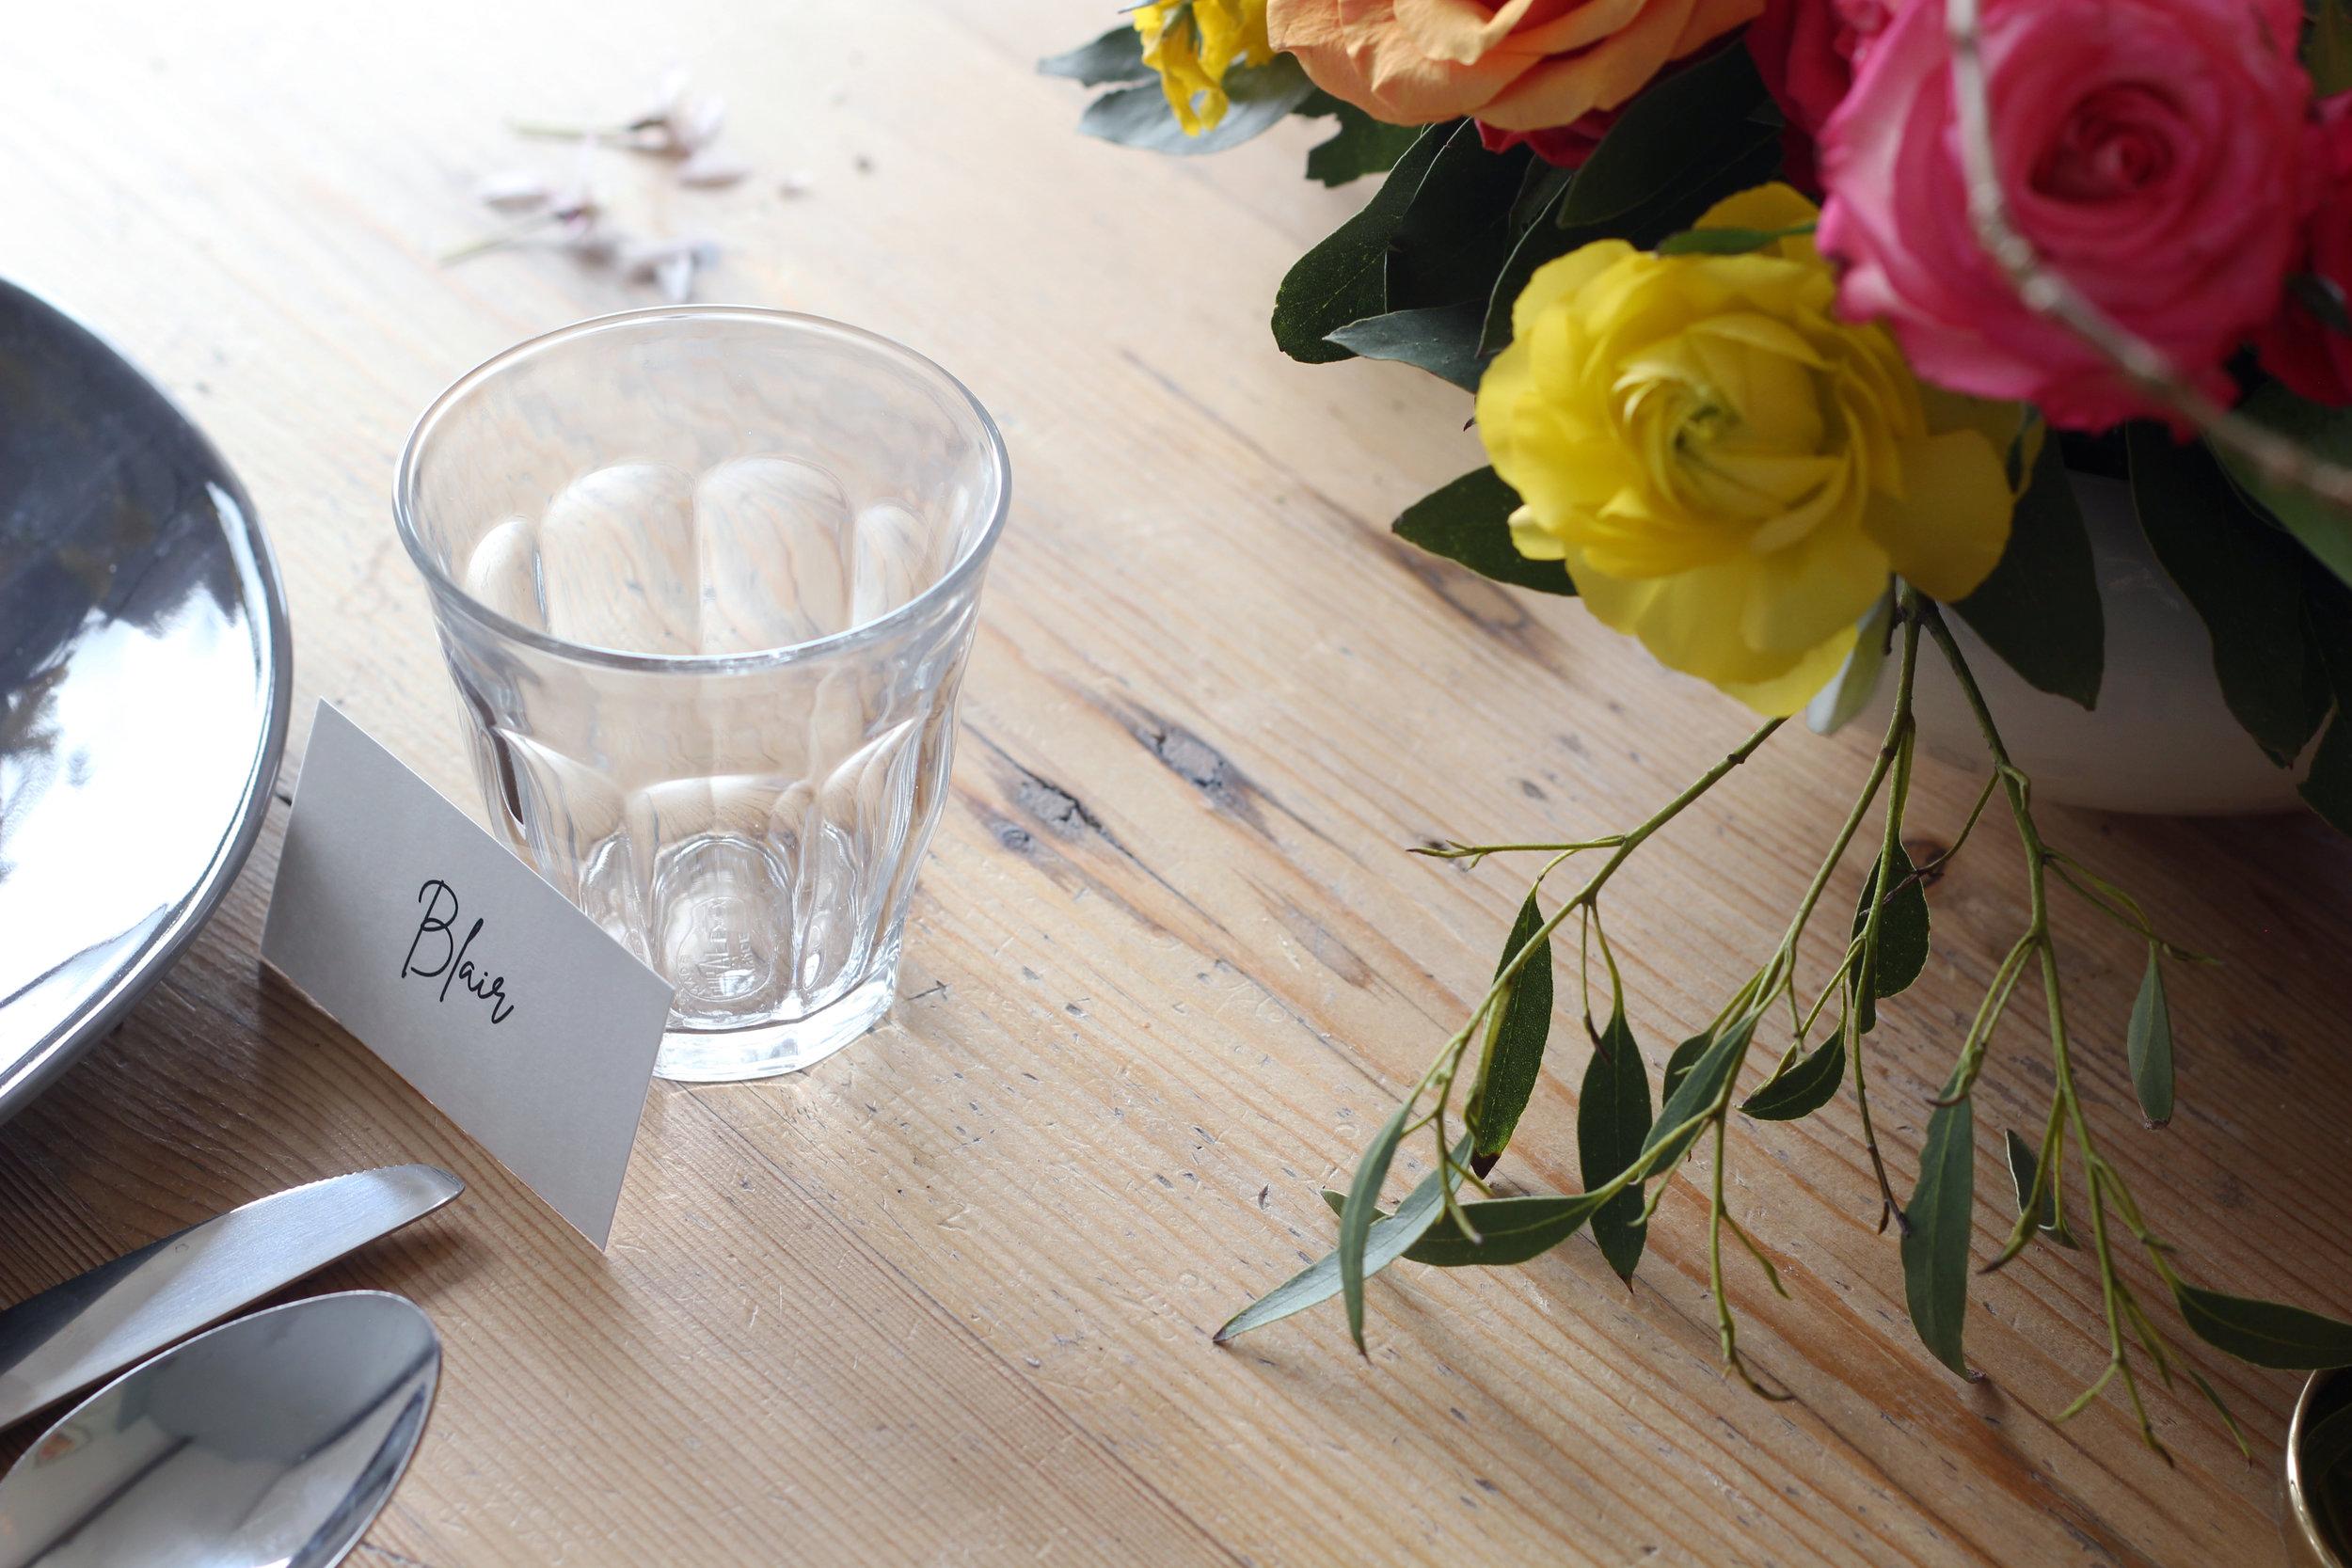 Callie-Pettigrew-Fruity-Florals-5.jpg